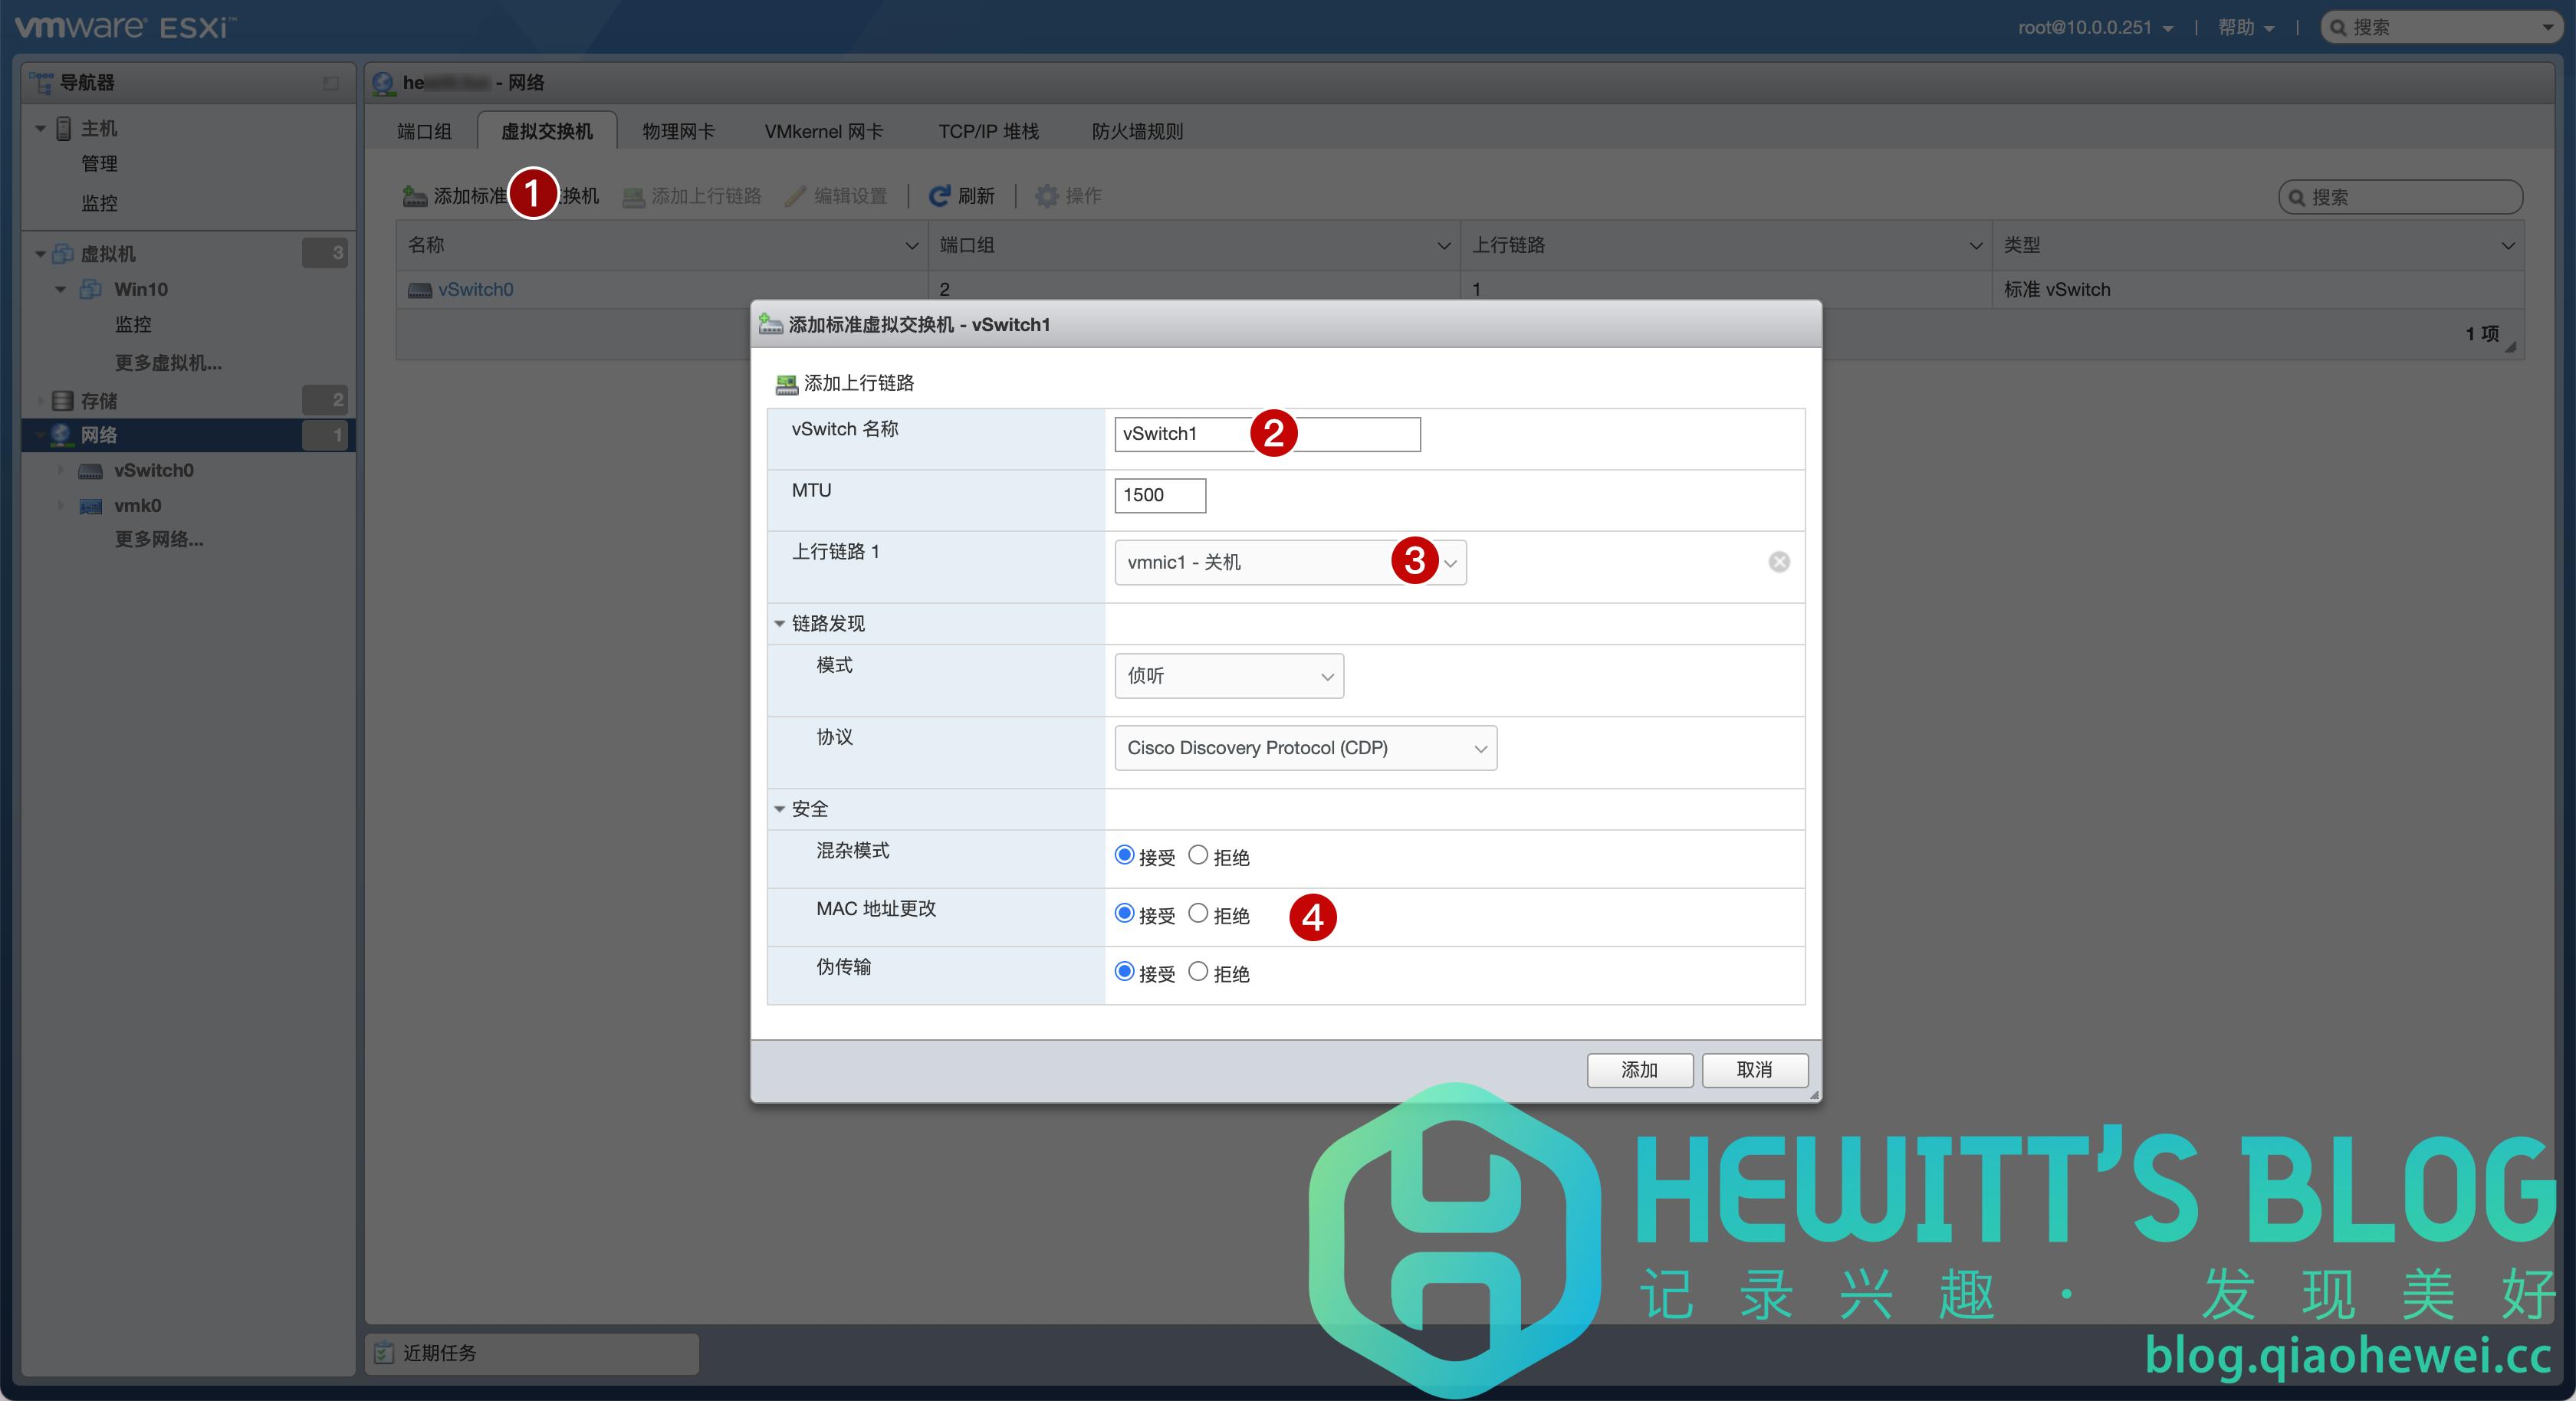 ESXI安装Mikrotik RouterOS(ROS)软路由部署指南(附授权镜像下载)插图3